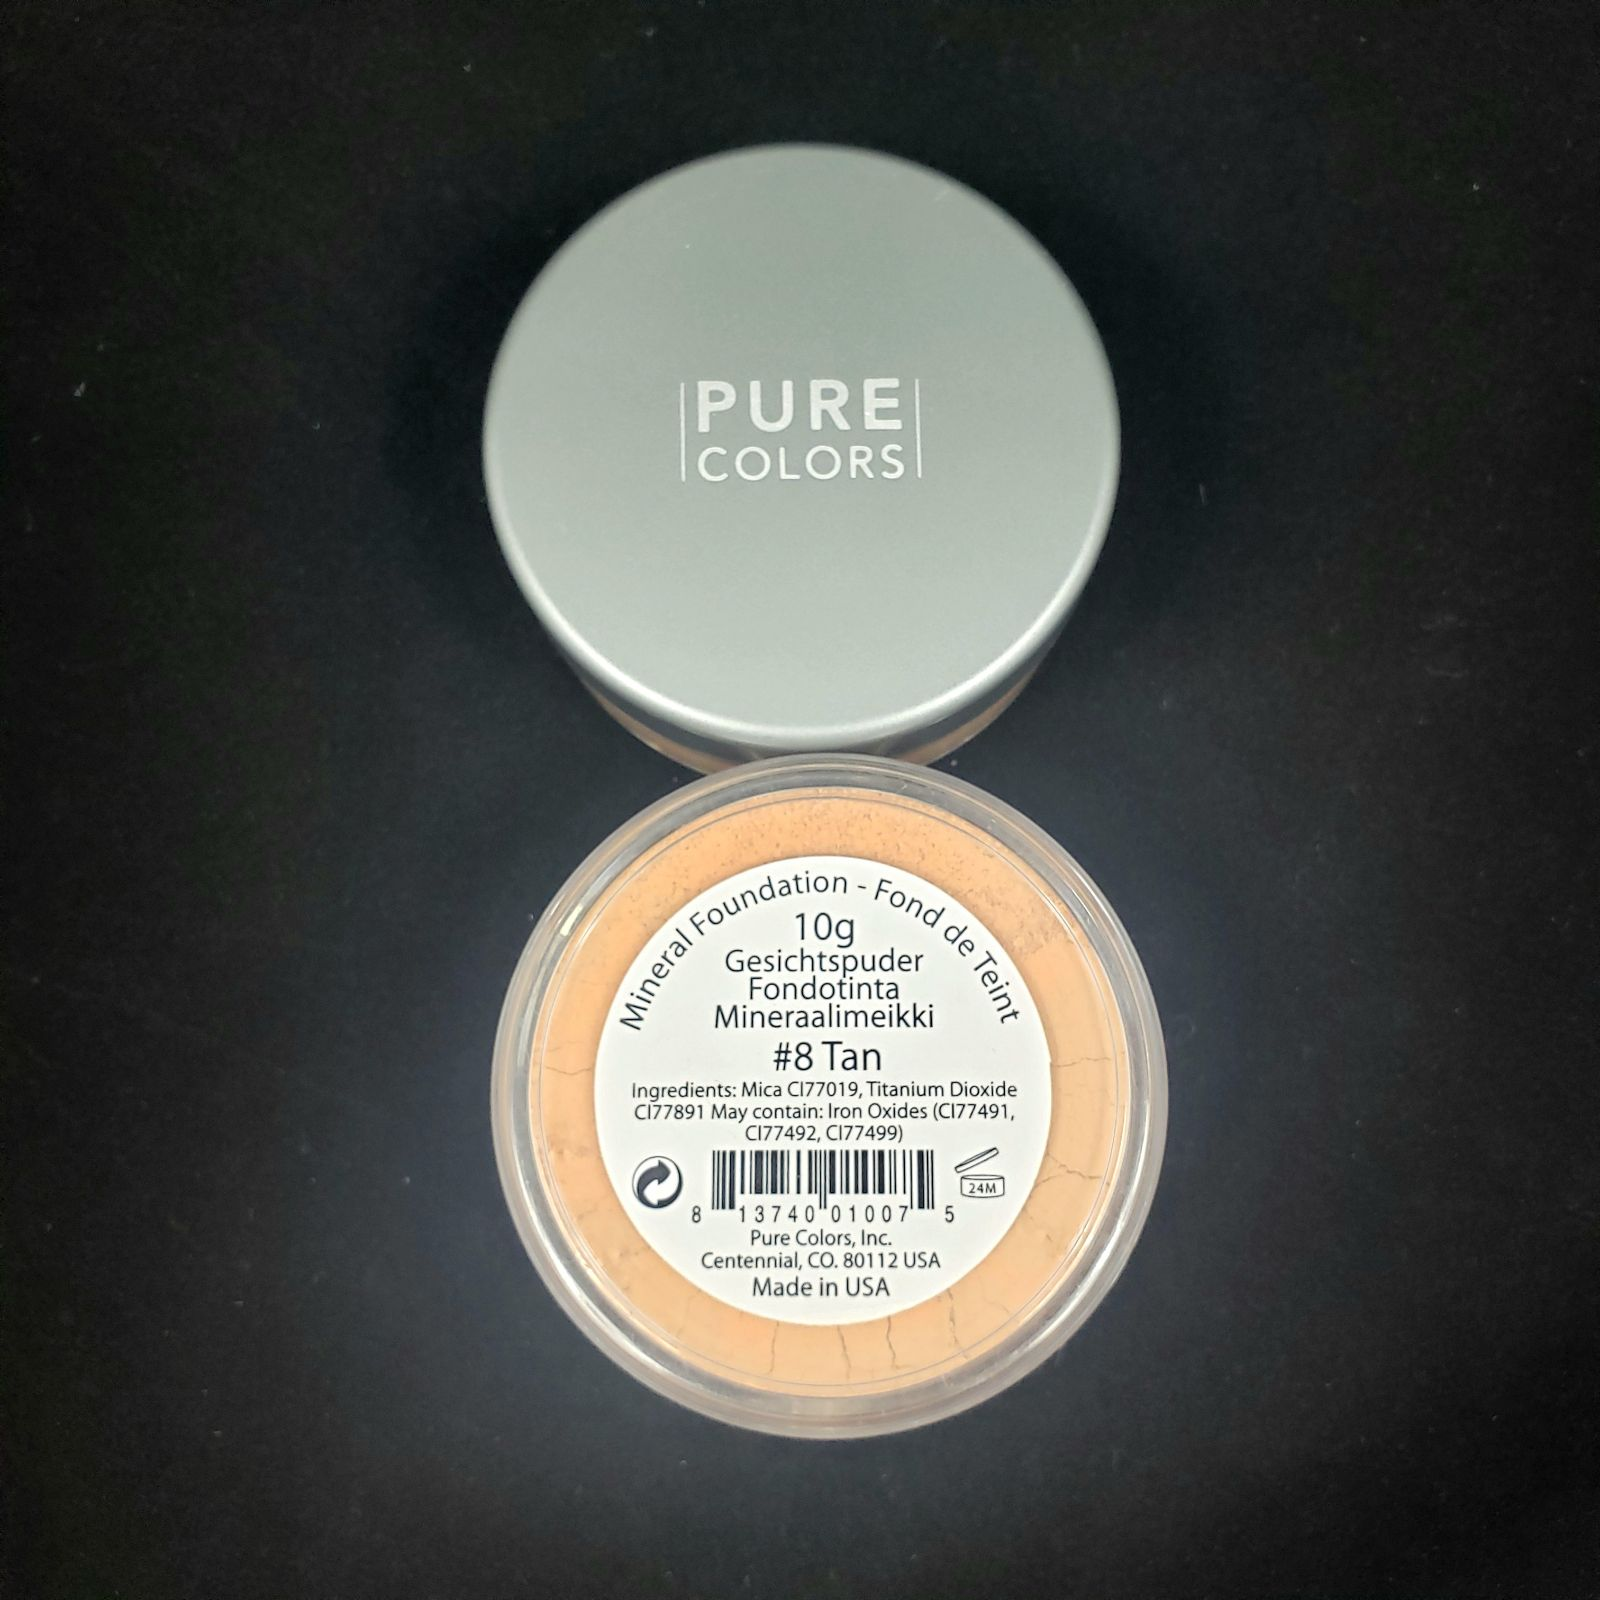 Pure Color #8 Tan Mineral Foundation